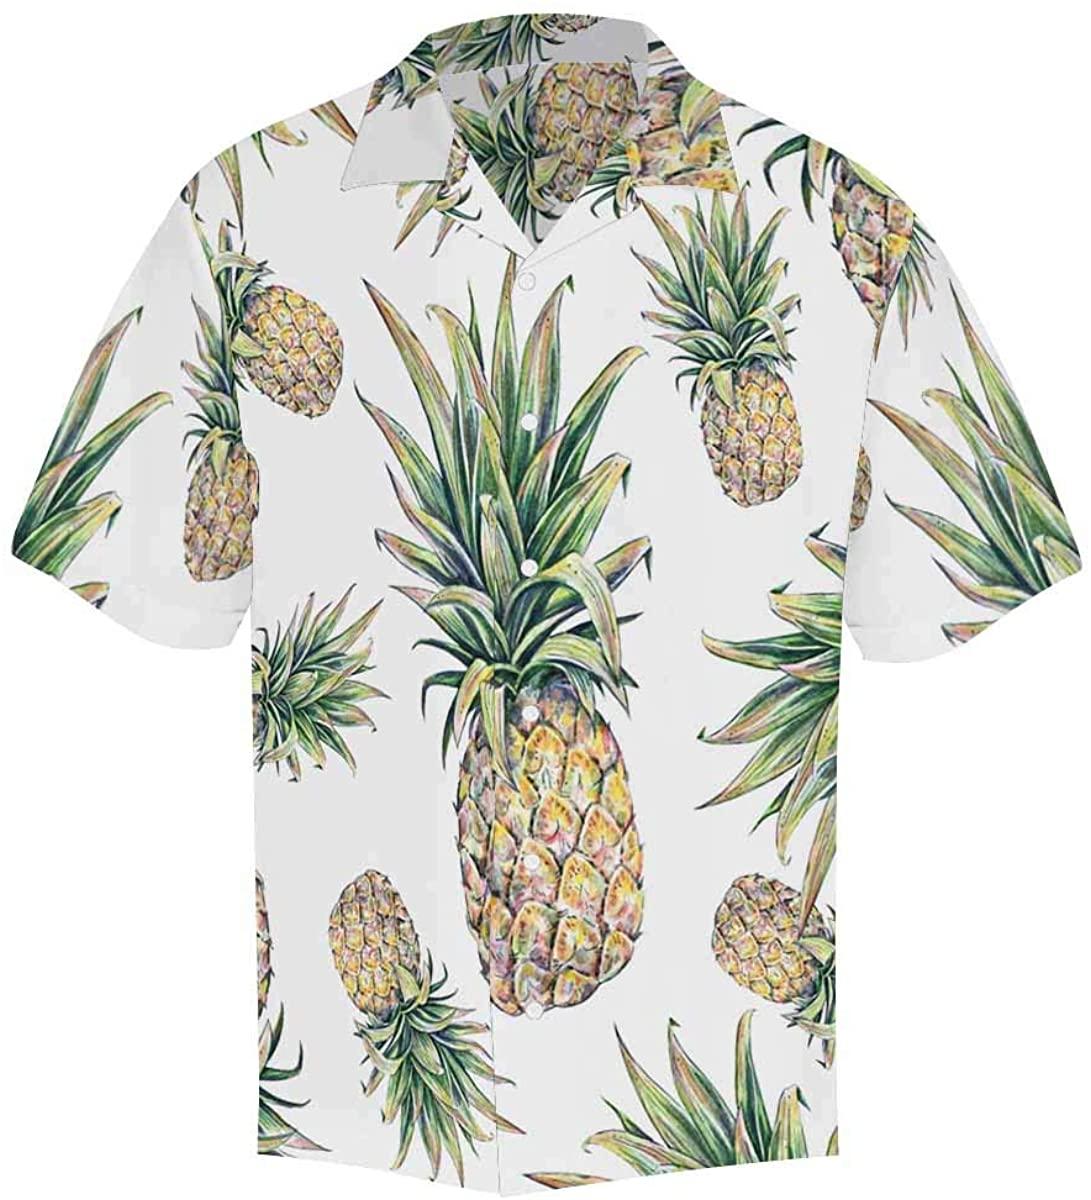 INTERESTPRINT Mens Shirt Peacock Short Sleeve Casual Button Up Mens Shirts